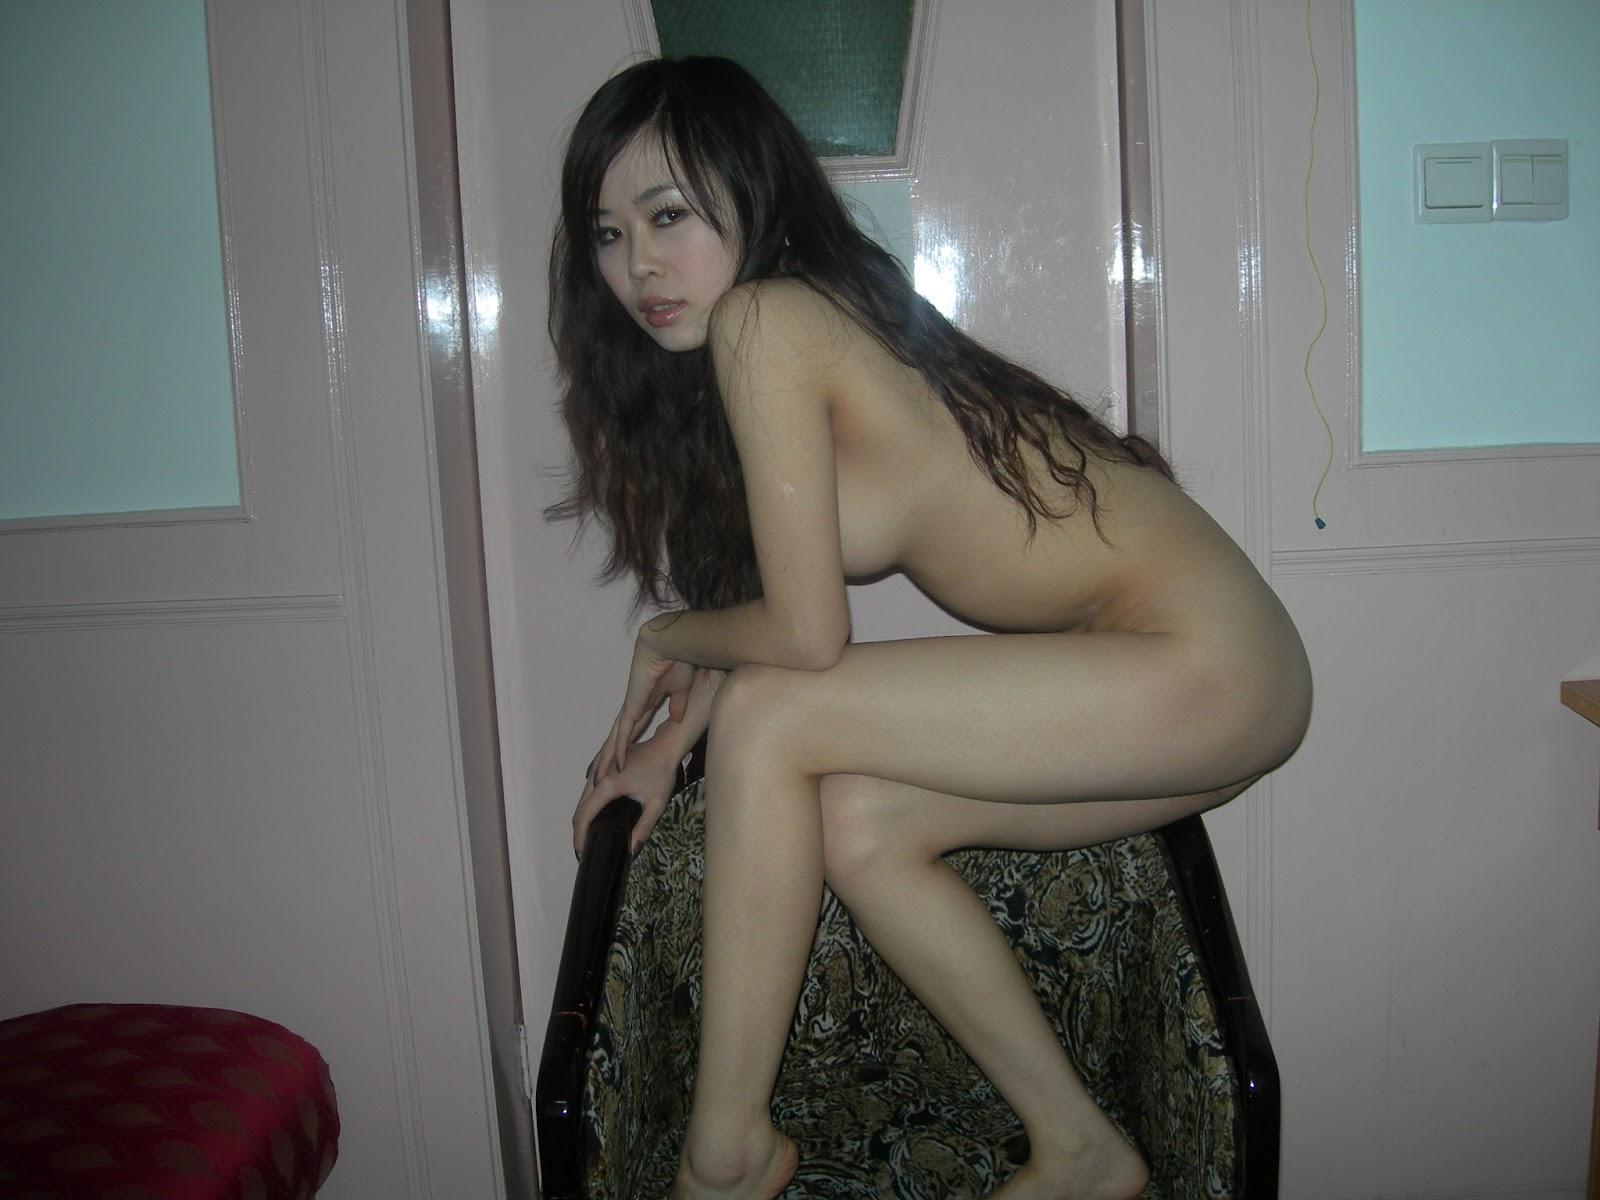 Japanese girl masturbation cellphone 11 - 56 part 3